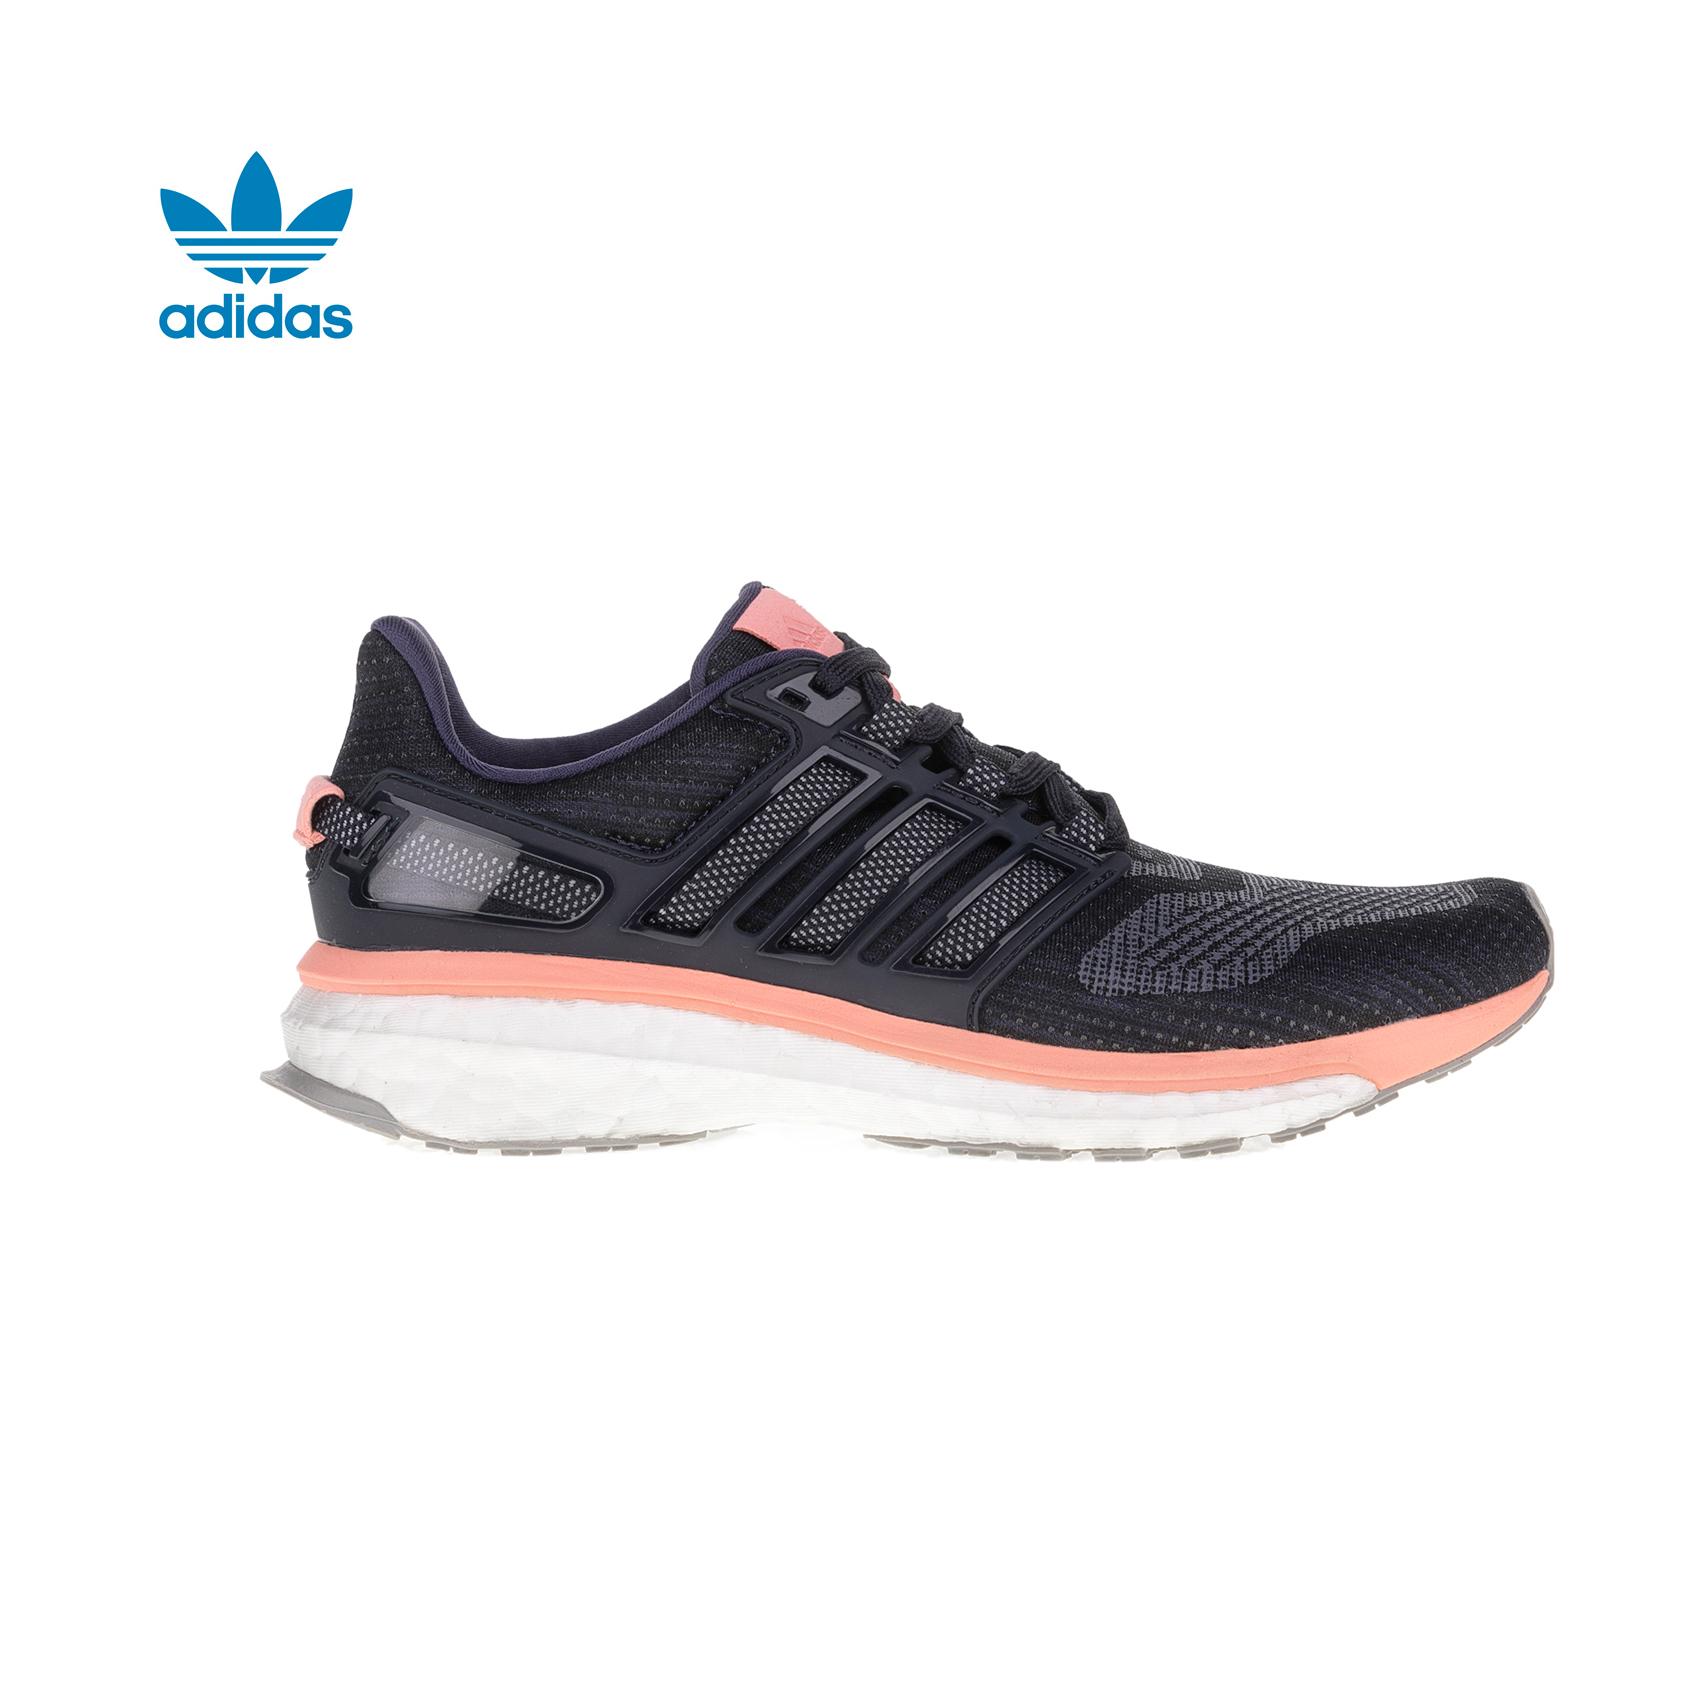 adidas Originals – Γυναικεία παπούτσια adidas energy boost 3 γκρι